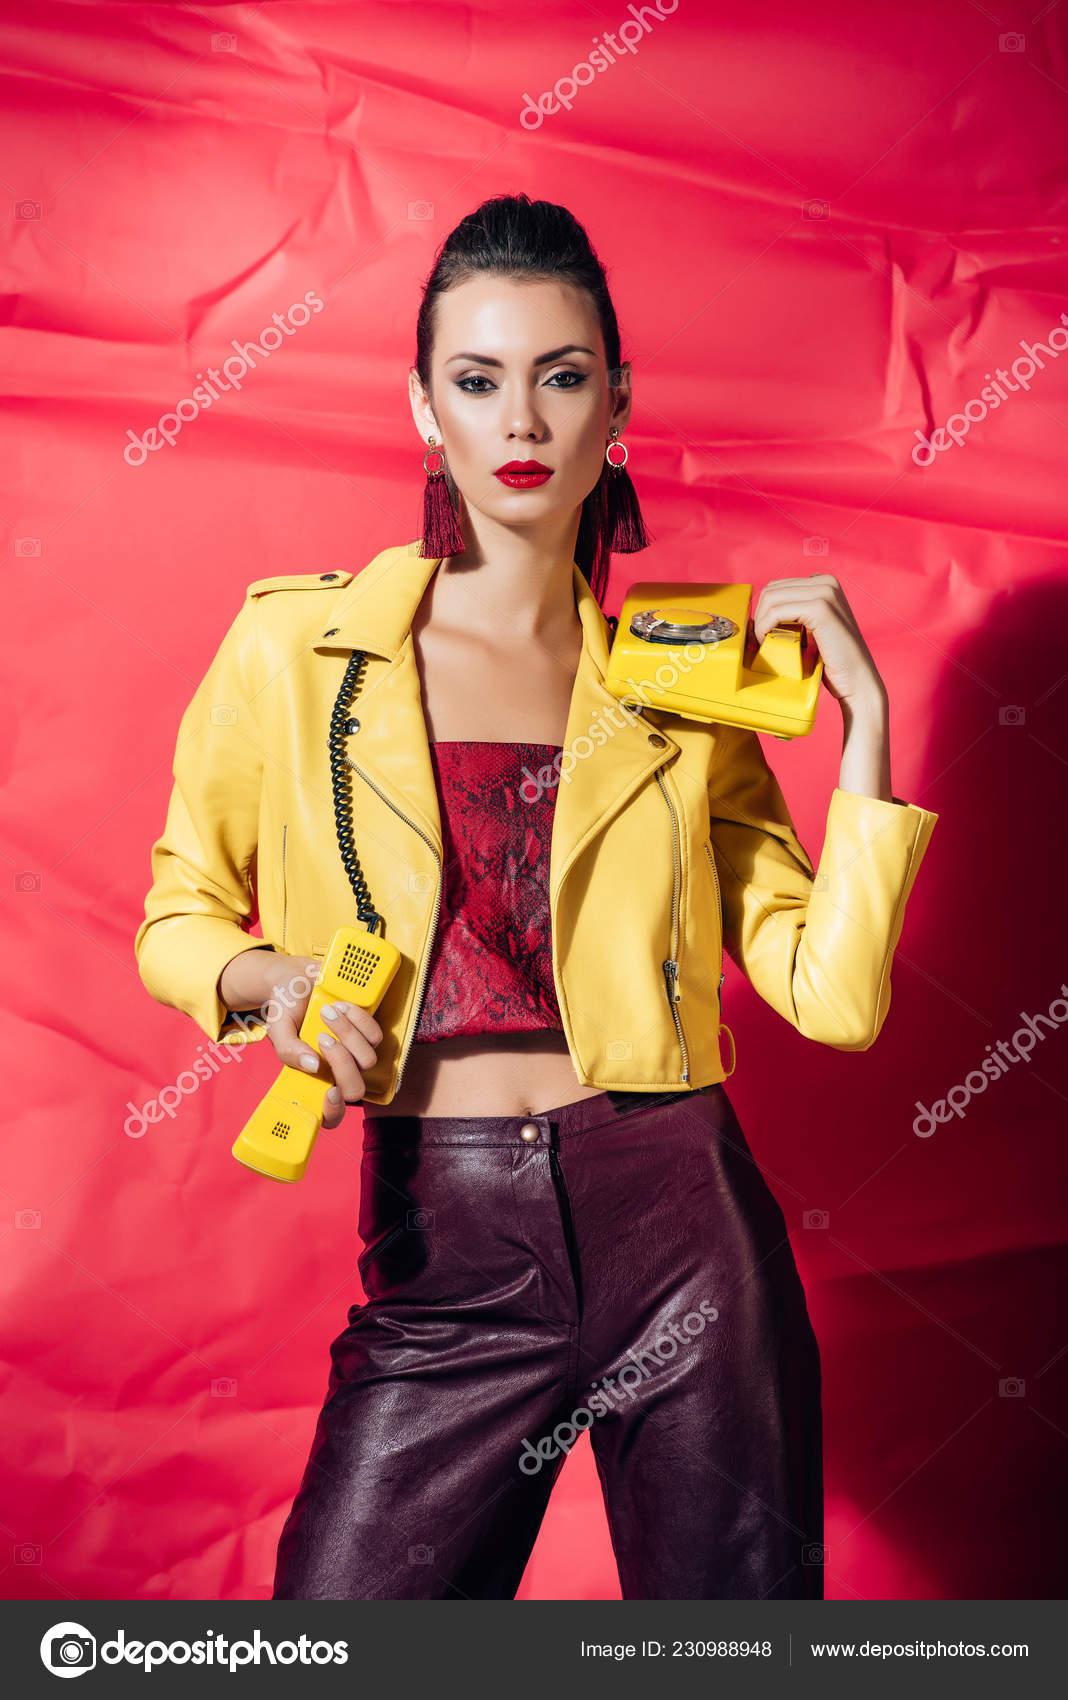 online retailer e7040 83632 Giovane Donna Alla Moda Giacca Pelle Gialla Che Posa Con ...